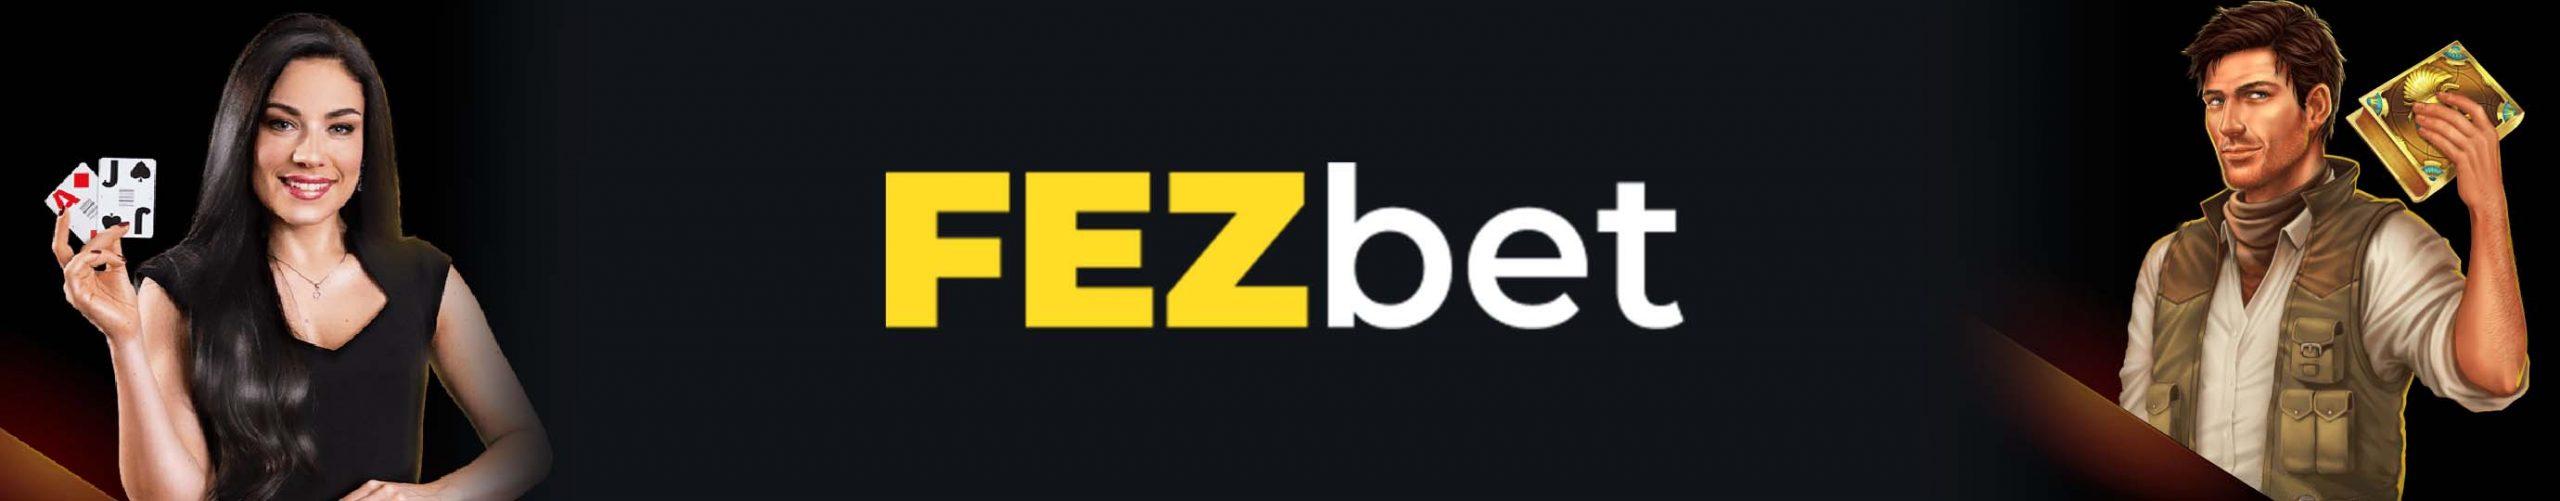 FEZbet Casinotest